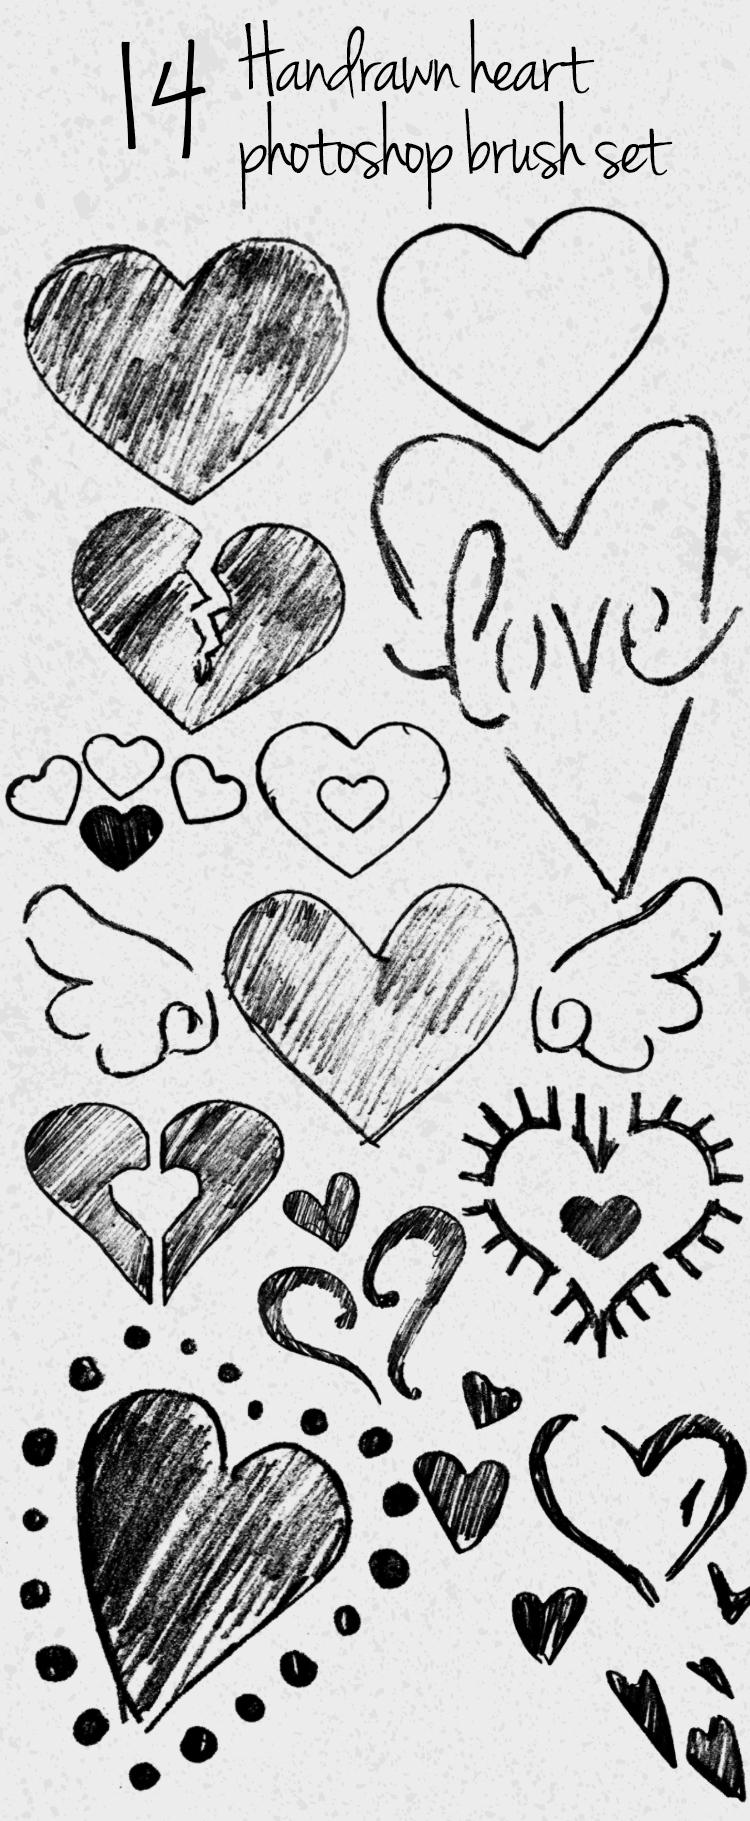 handdrawn-heart-photoshop-brush-set